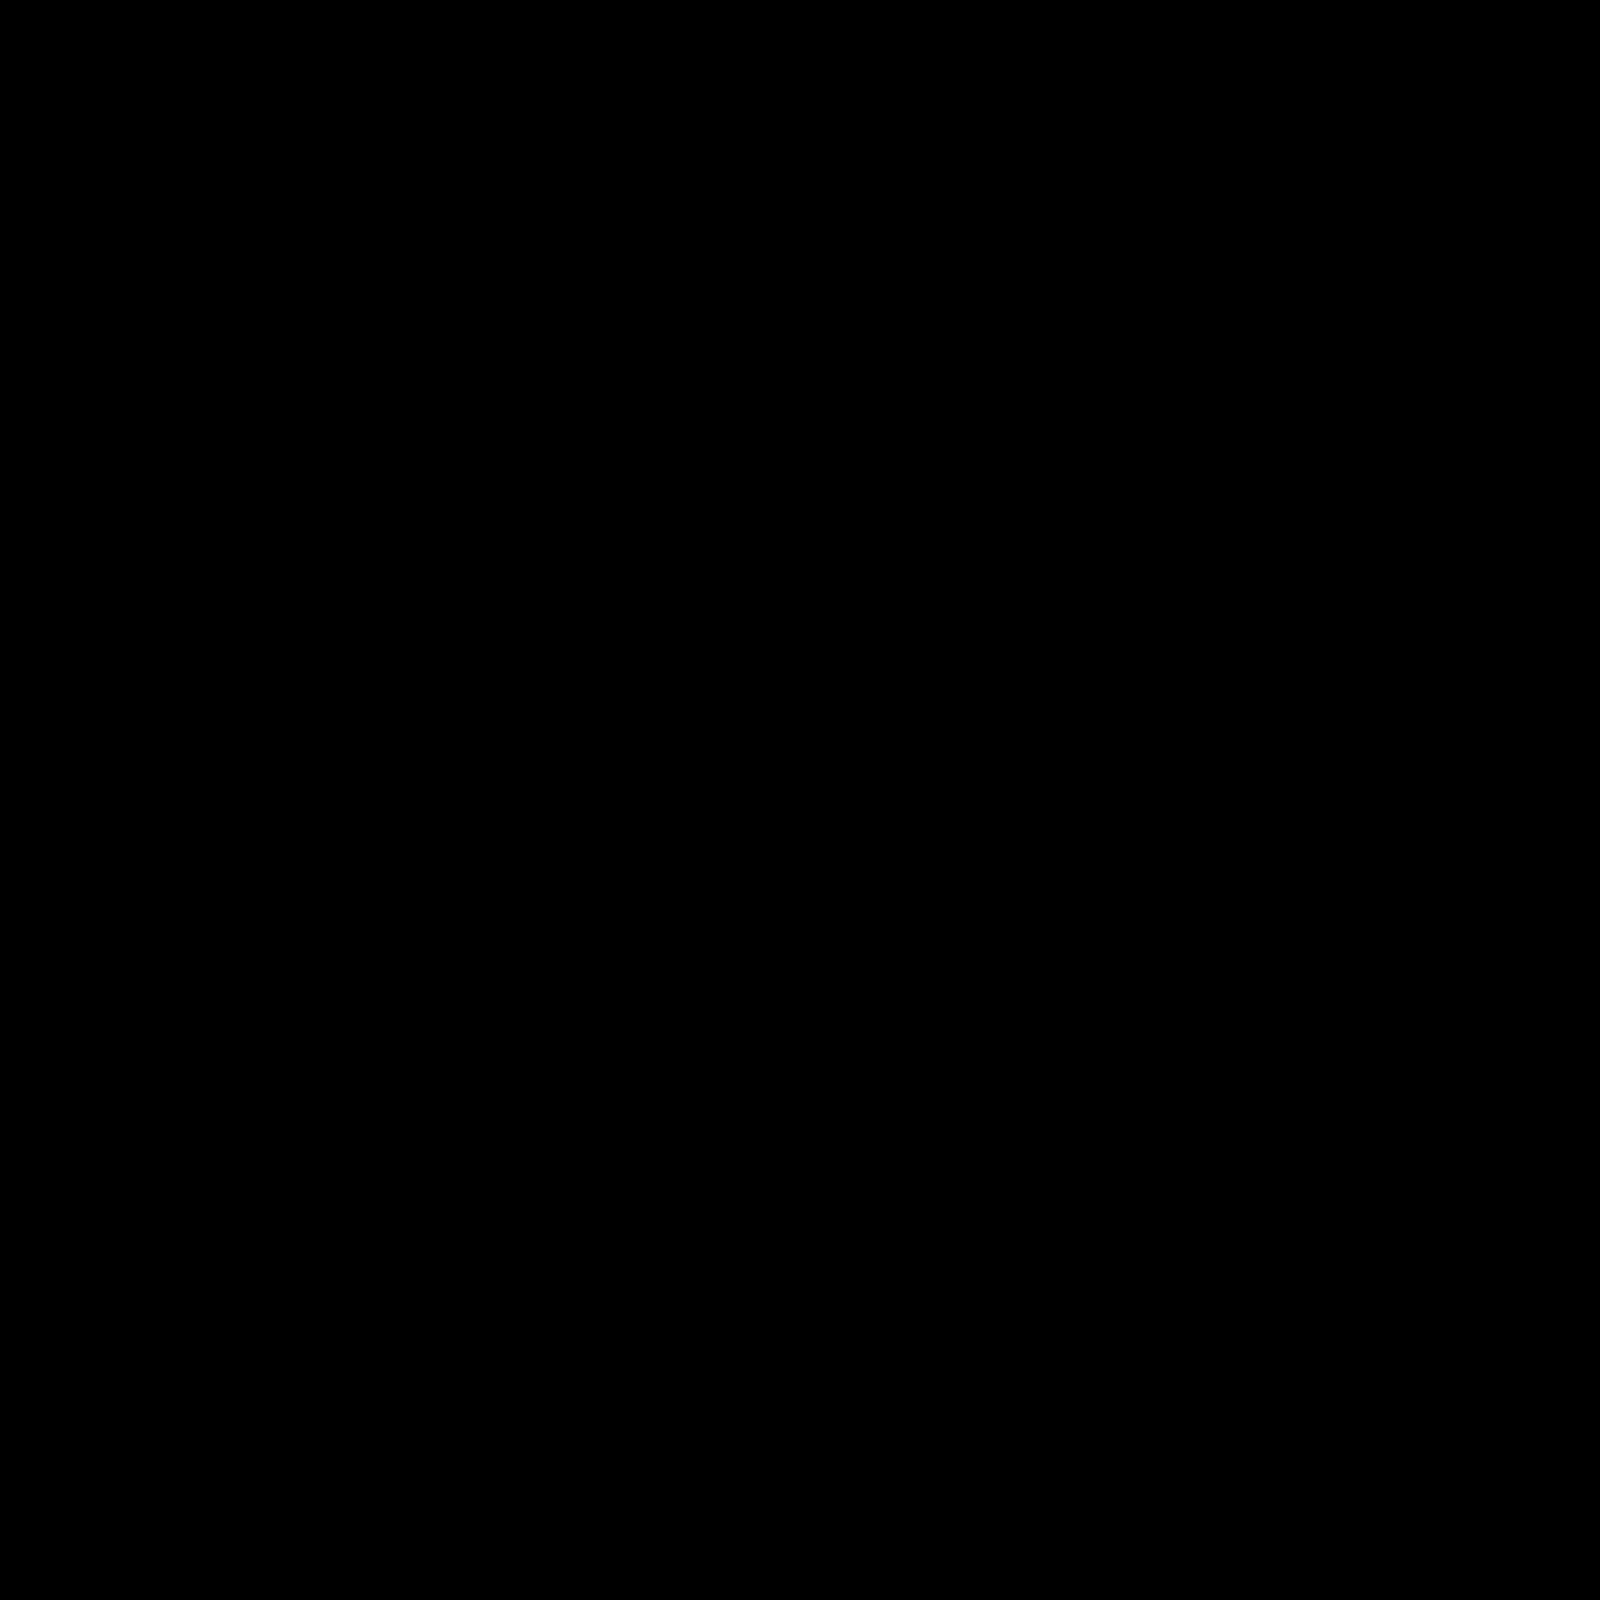 netflix-logo-png-black.png